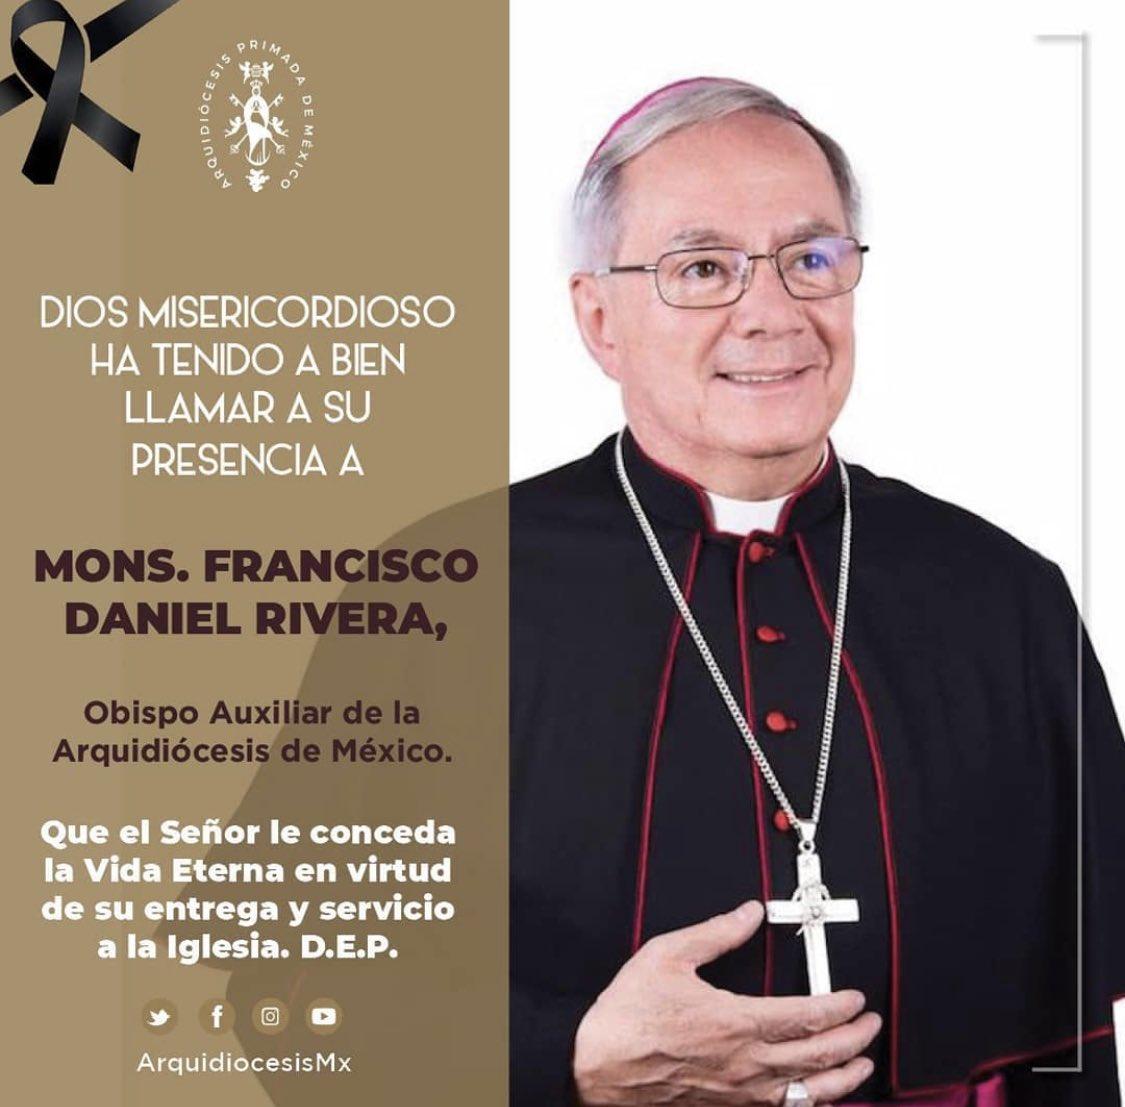 obispo auxiliar arquidiocesis